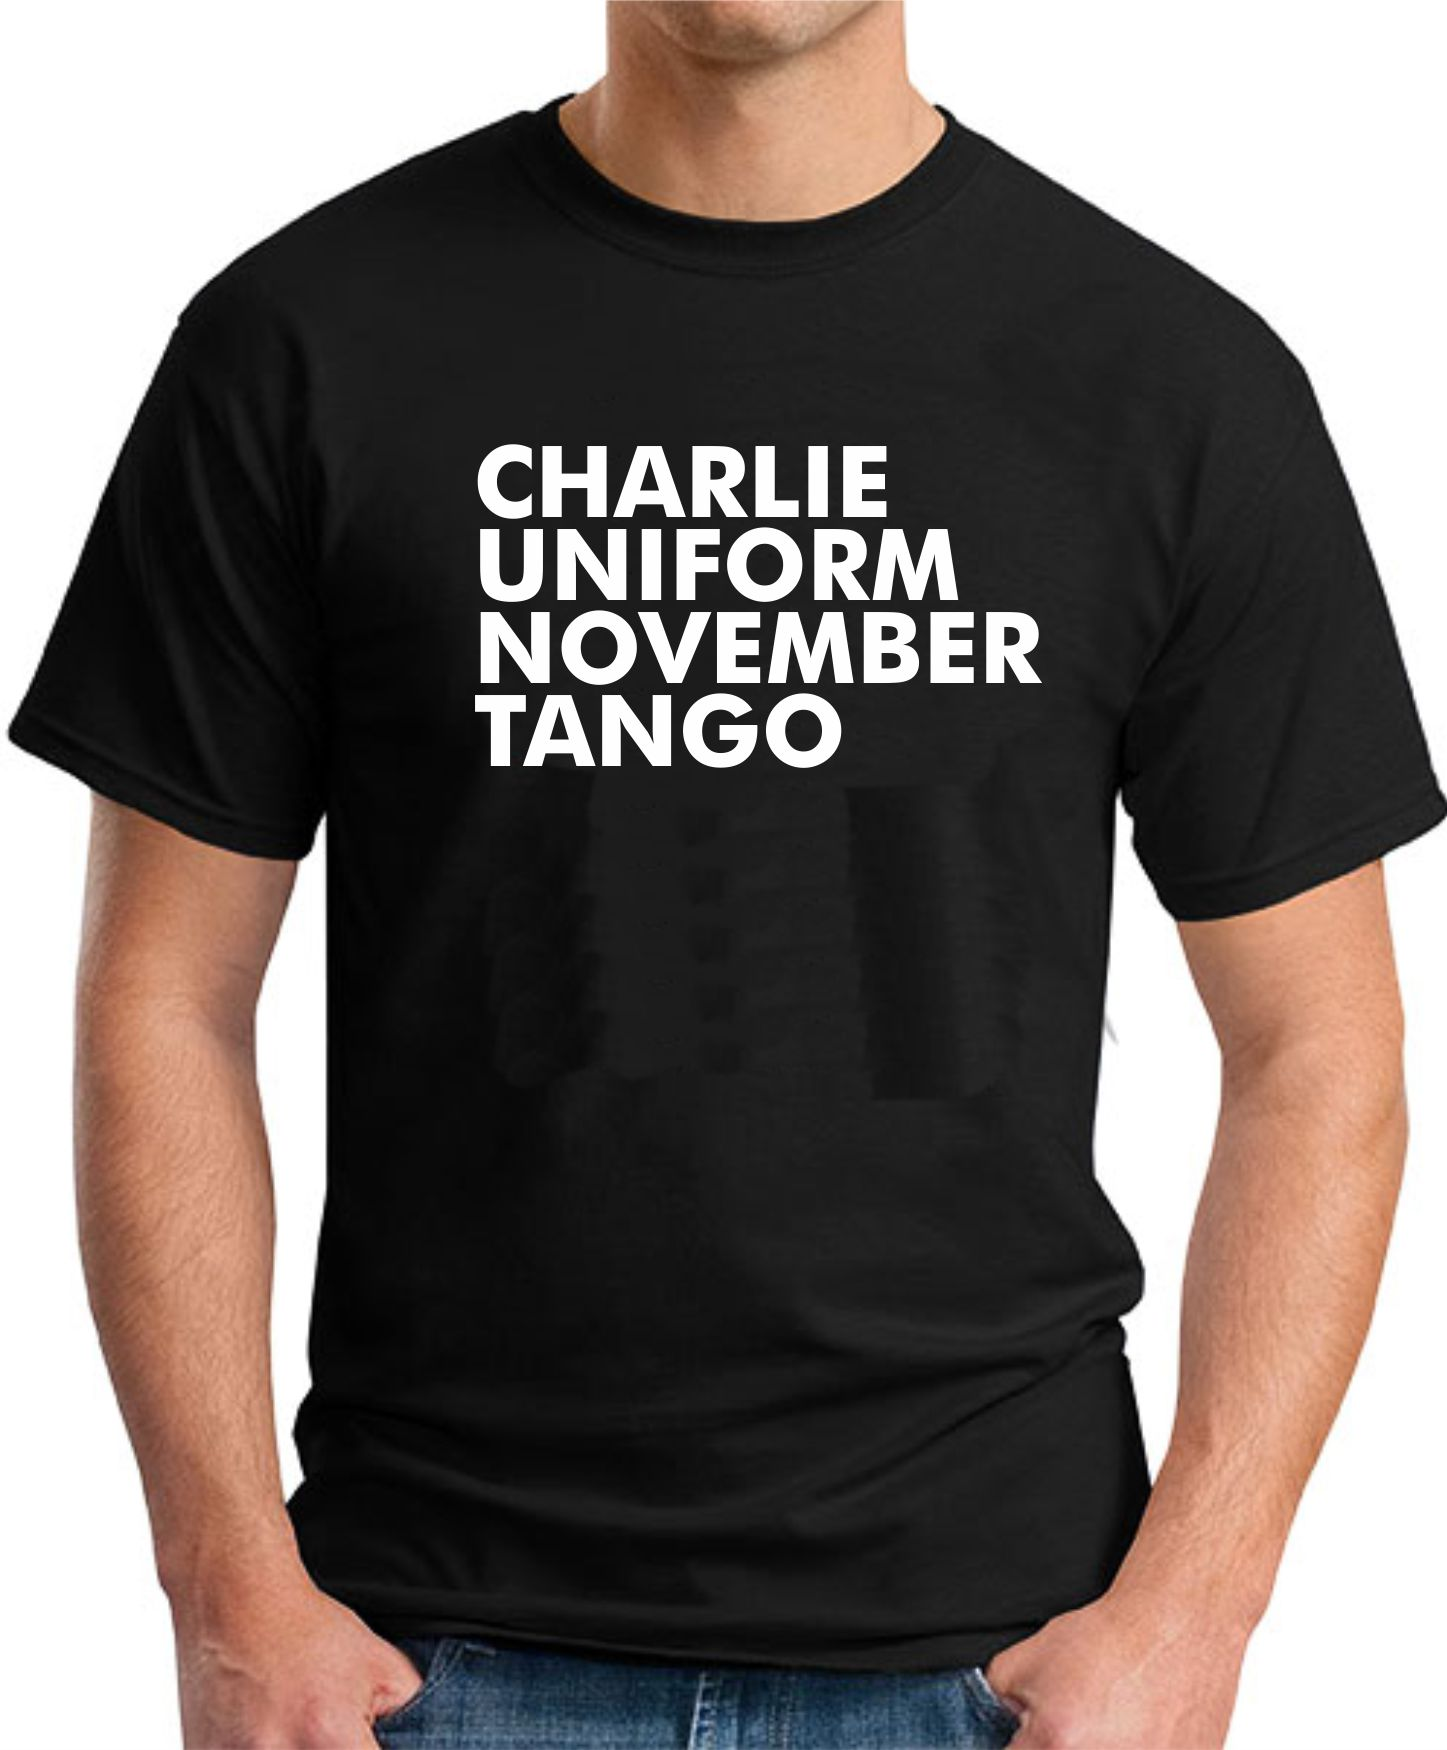 CHARLIE UNIFORM NOVEMBER TANGO BLACK